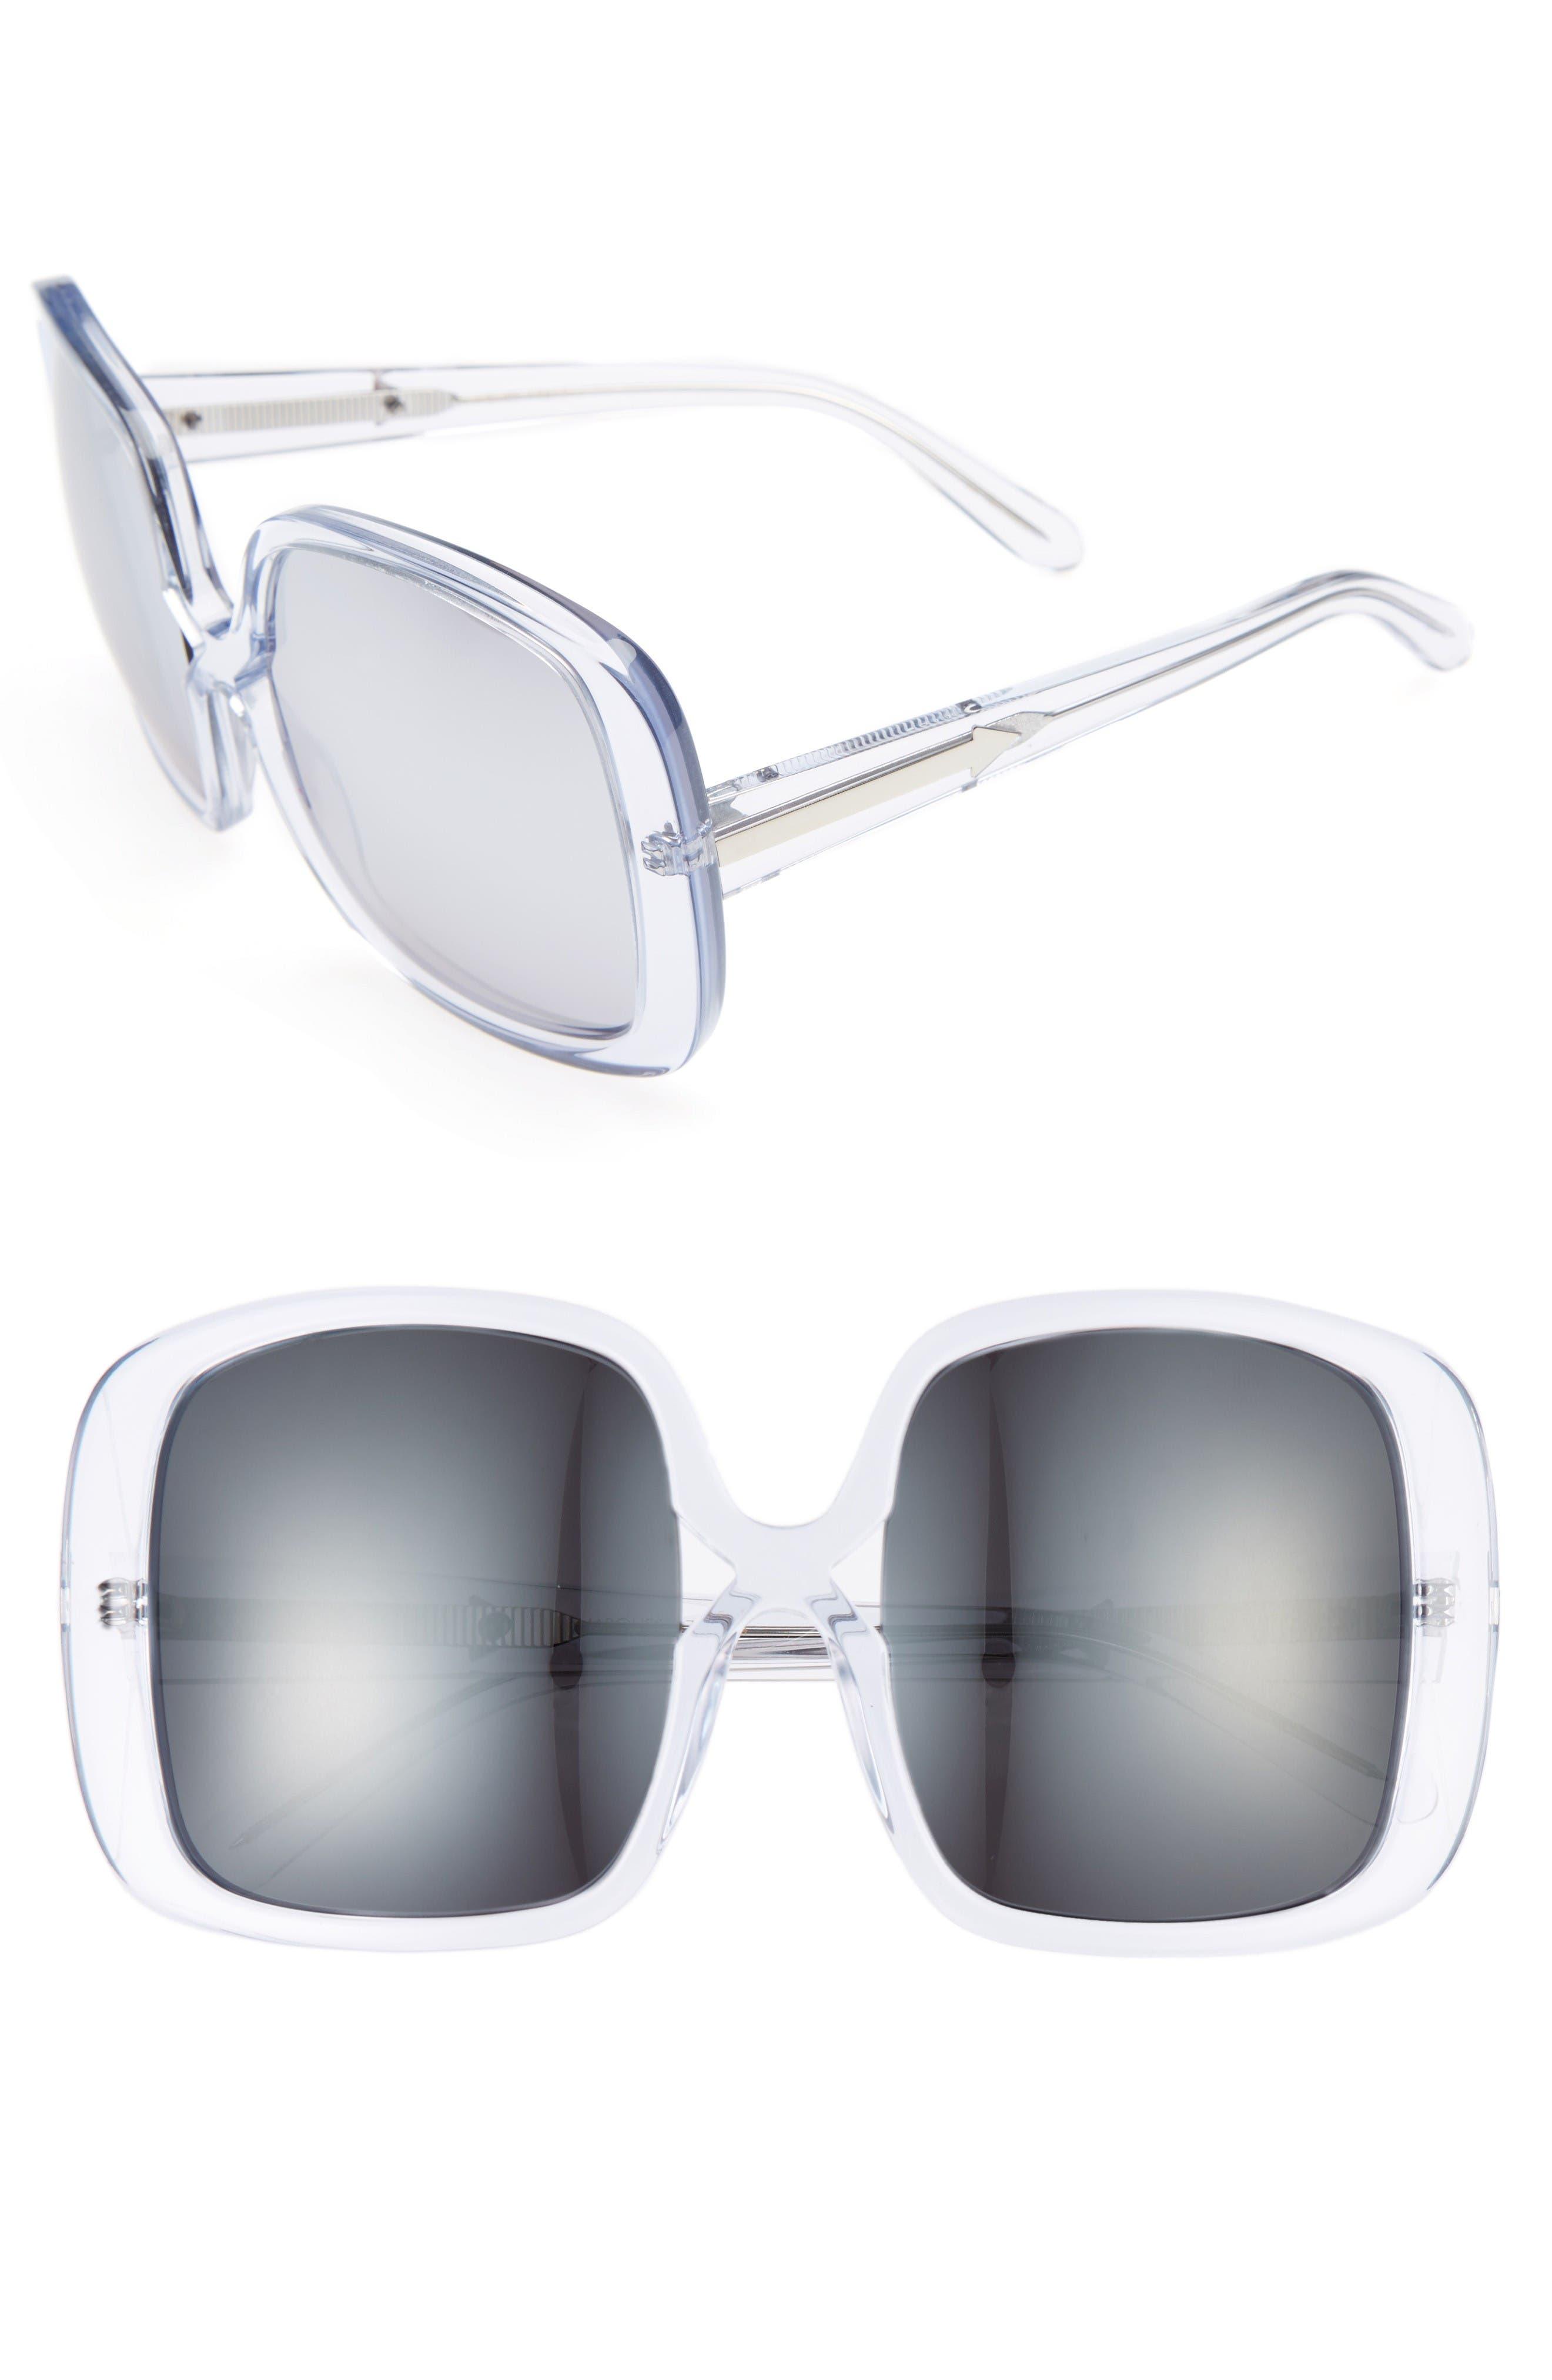 Main Image - Karen Walker Marques 55mm Square Sunglasses